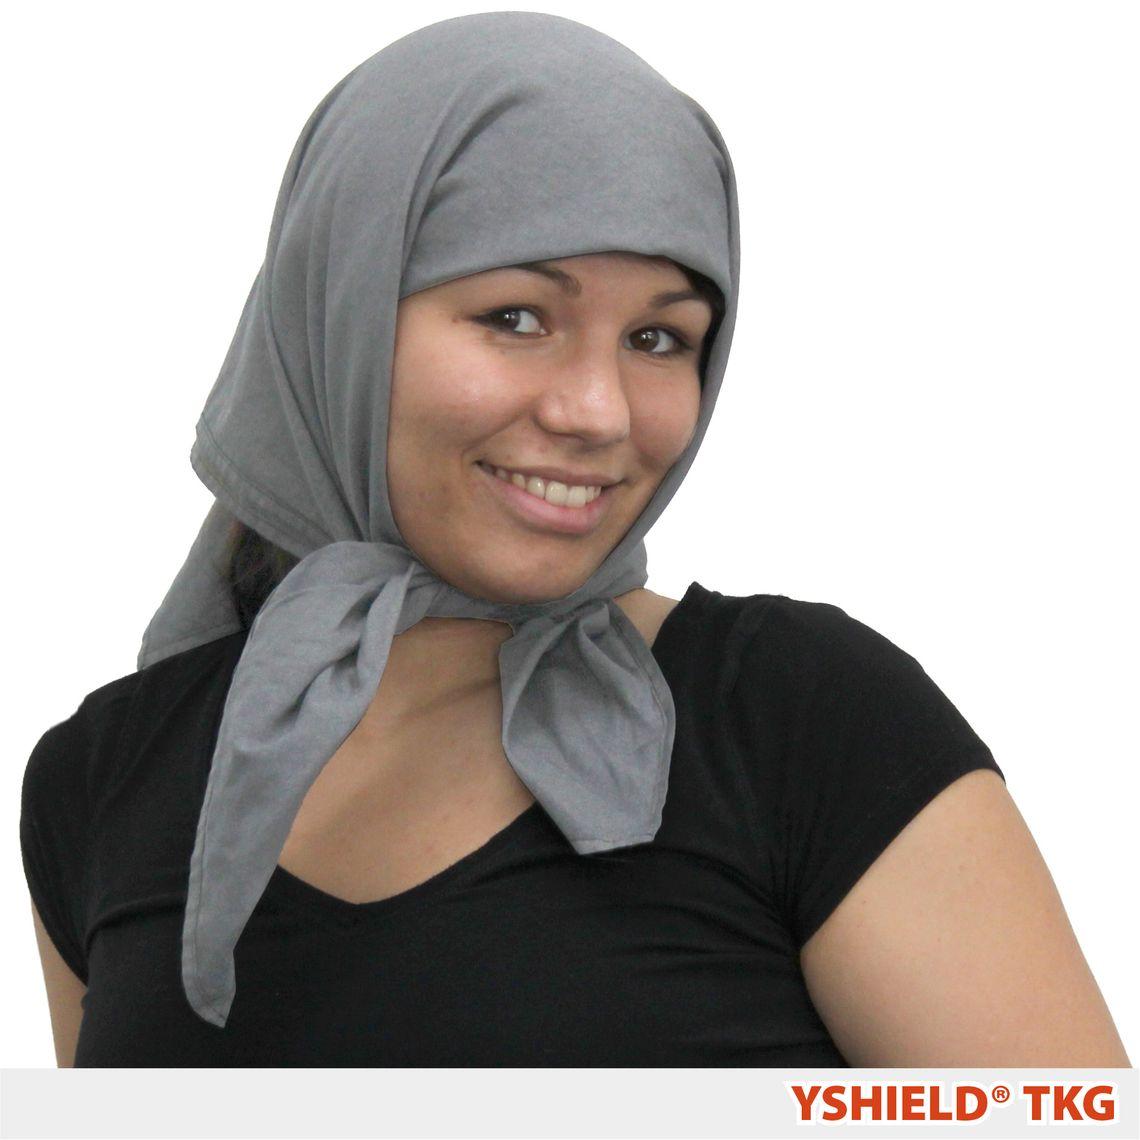 YSHIELD® TKG3   Abschirmendes Kopftuch   Steel-Gray Dreieckig